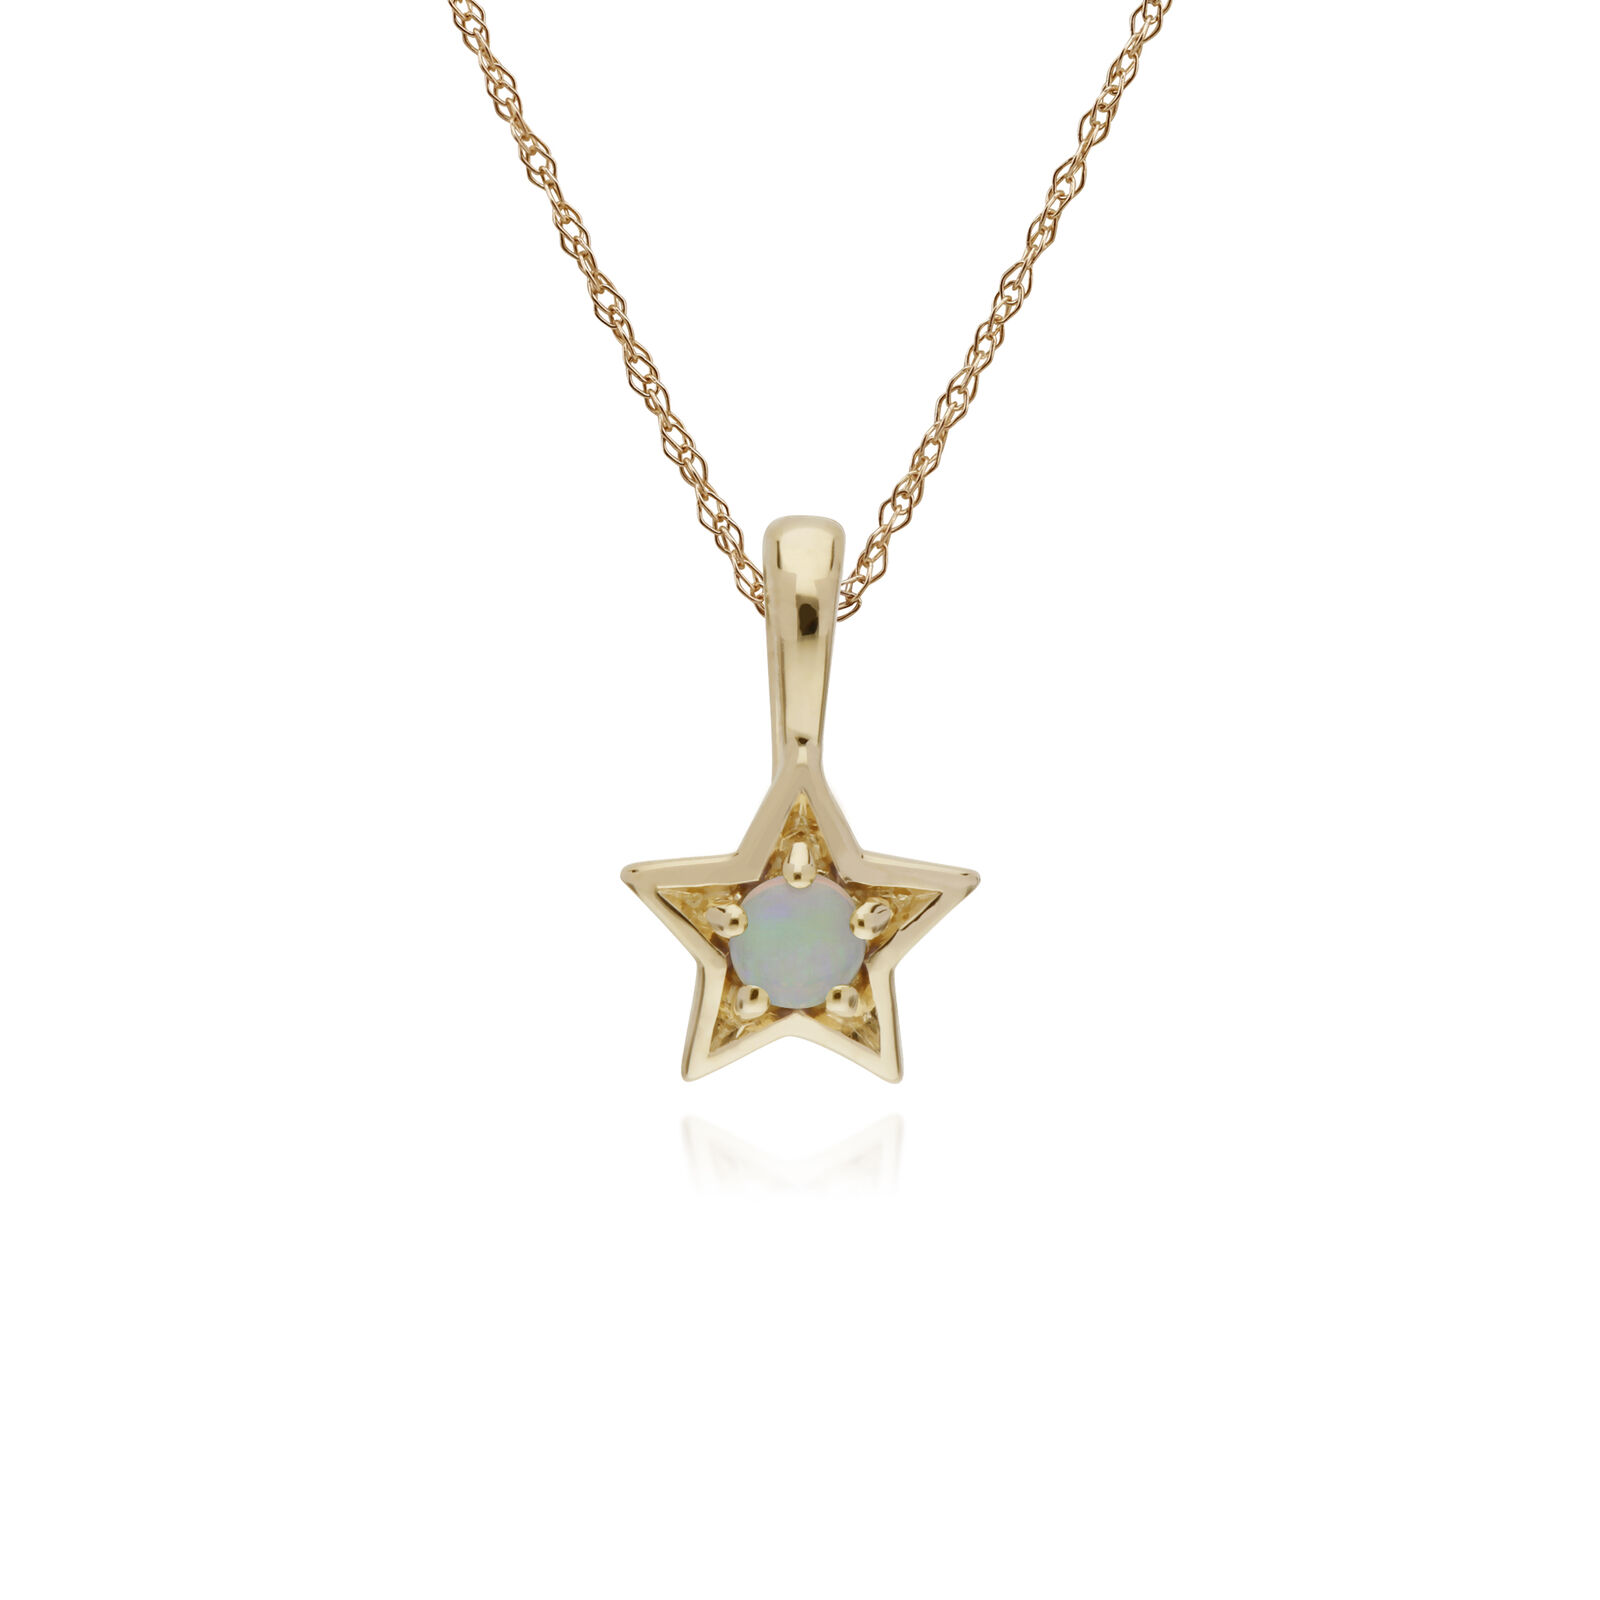 Gemondo 9ct Yellow gold Opal Single Stone Star Pendant on 45cm Chain